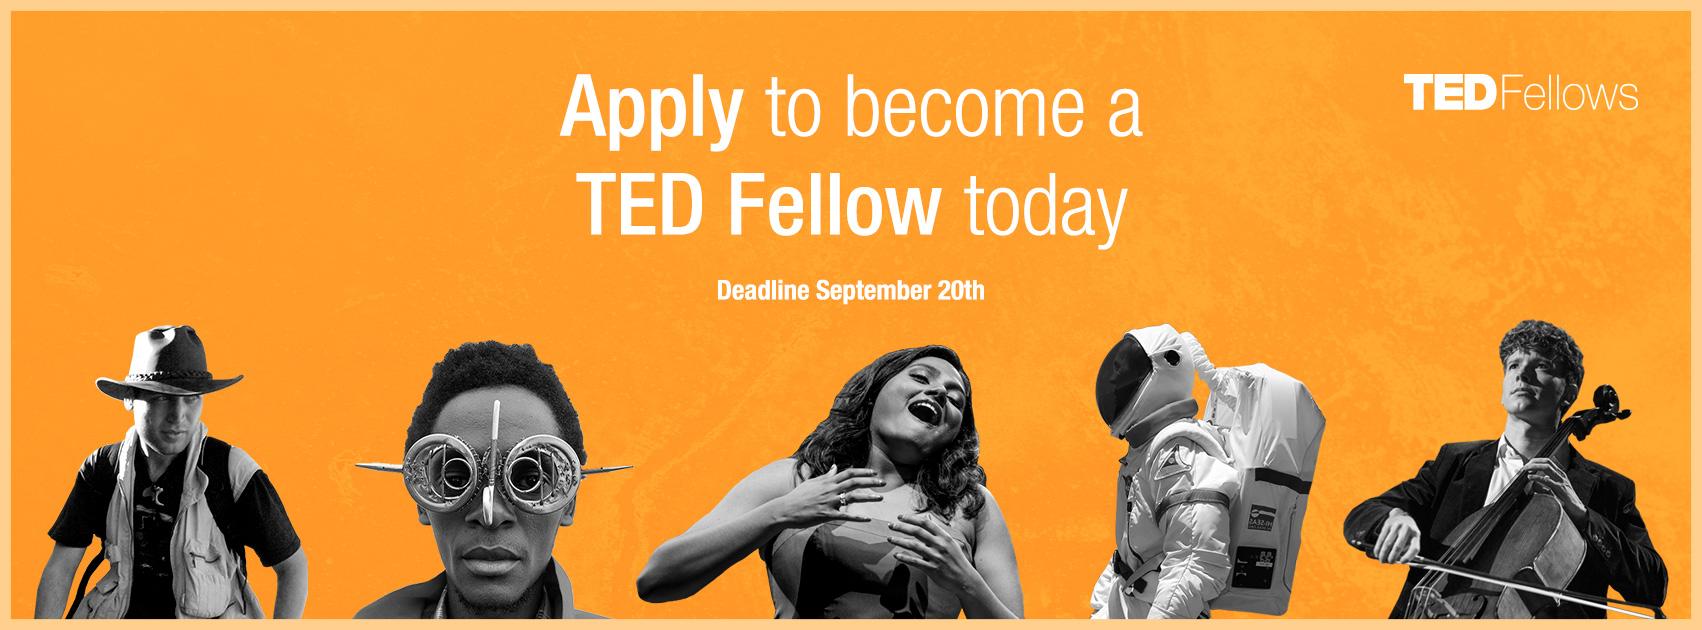 TED2016 Fellowship application